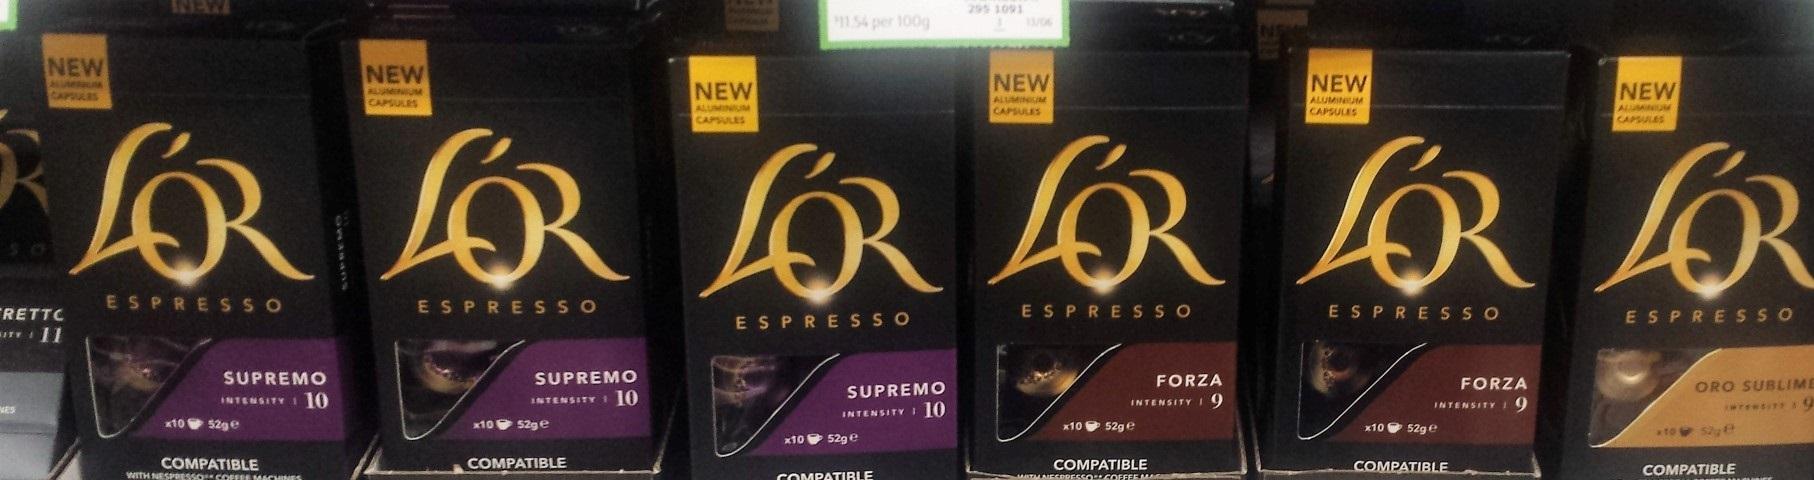 виды кофе лер